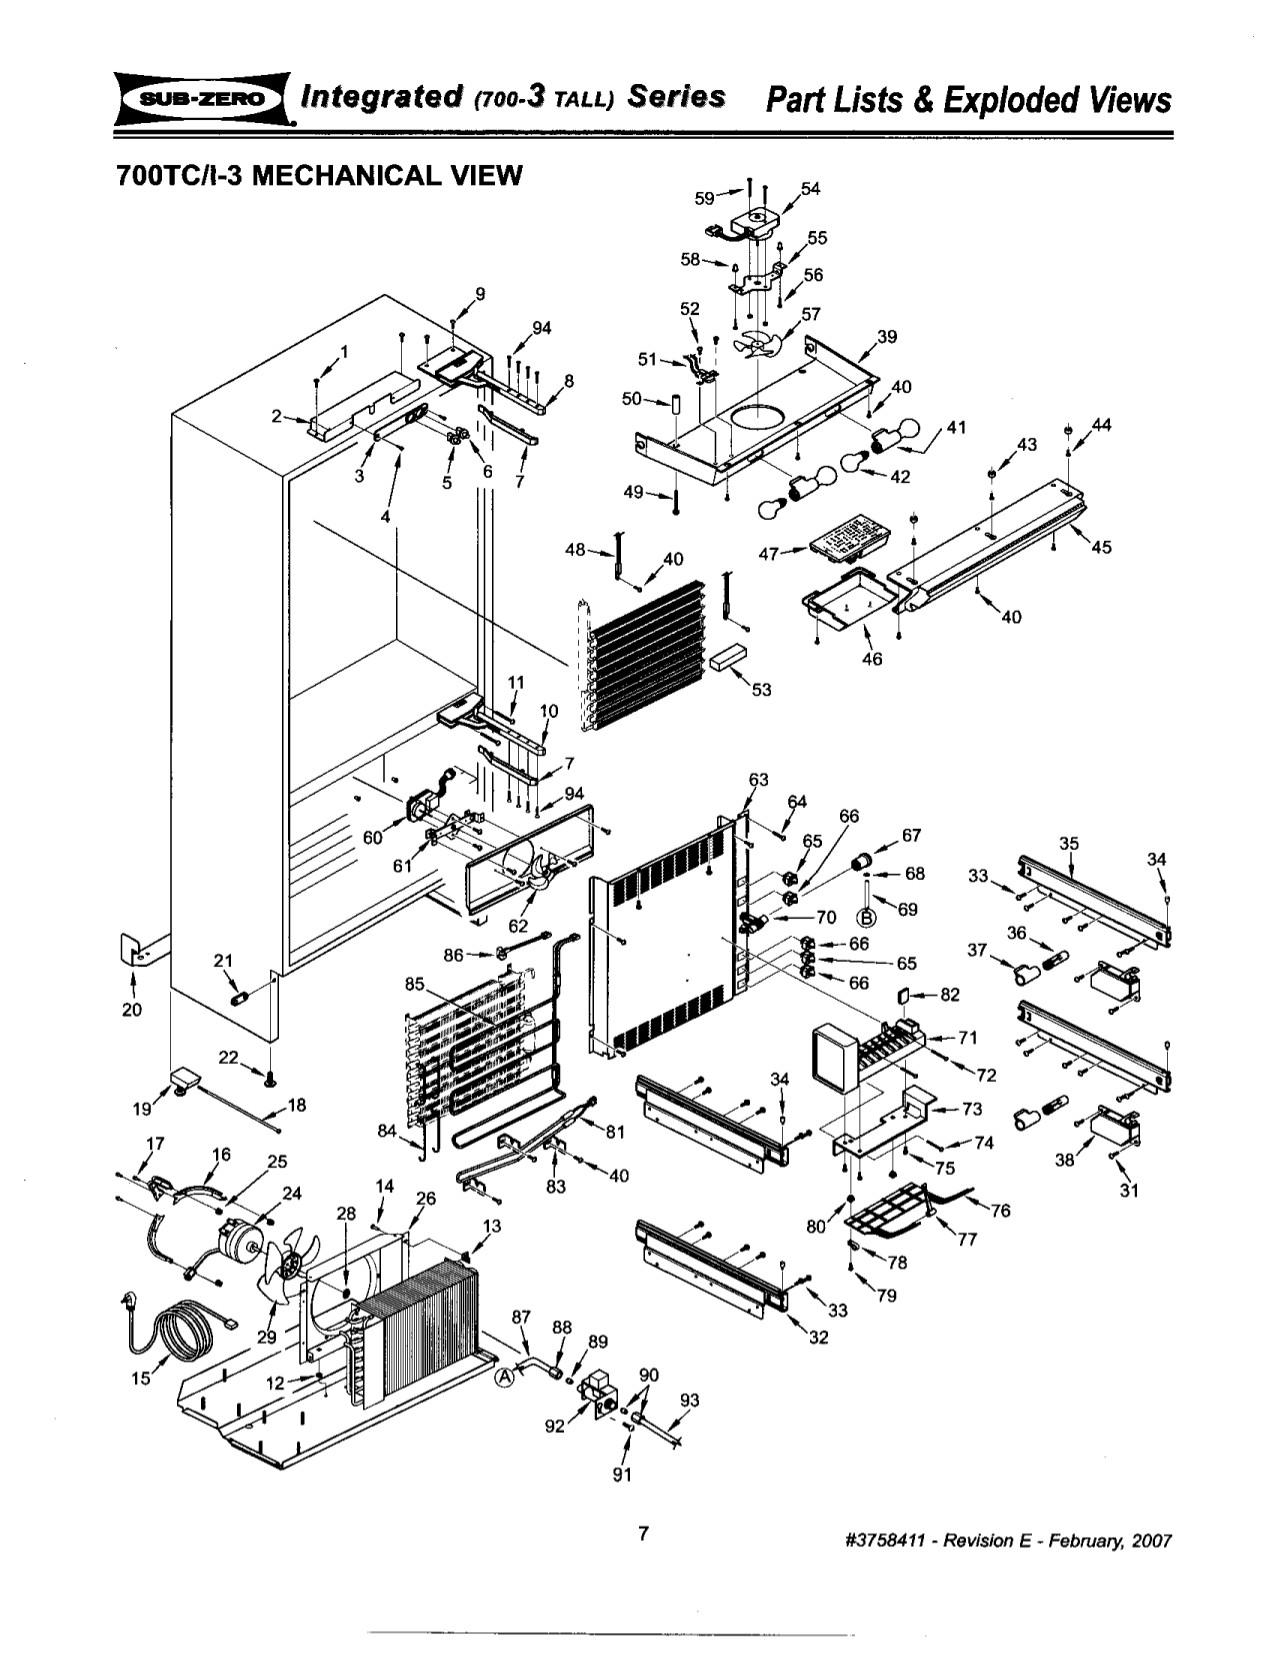 Cva Wolf Parts Diagram Diagram Wolf Parts Diagram Of Cva Wolf Parts Diagram